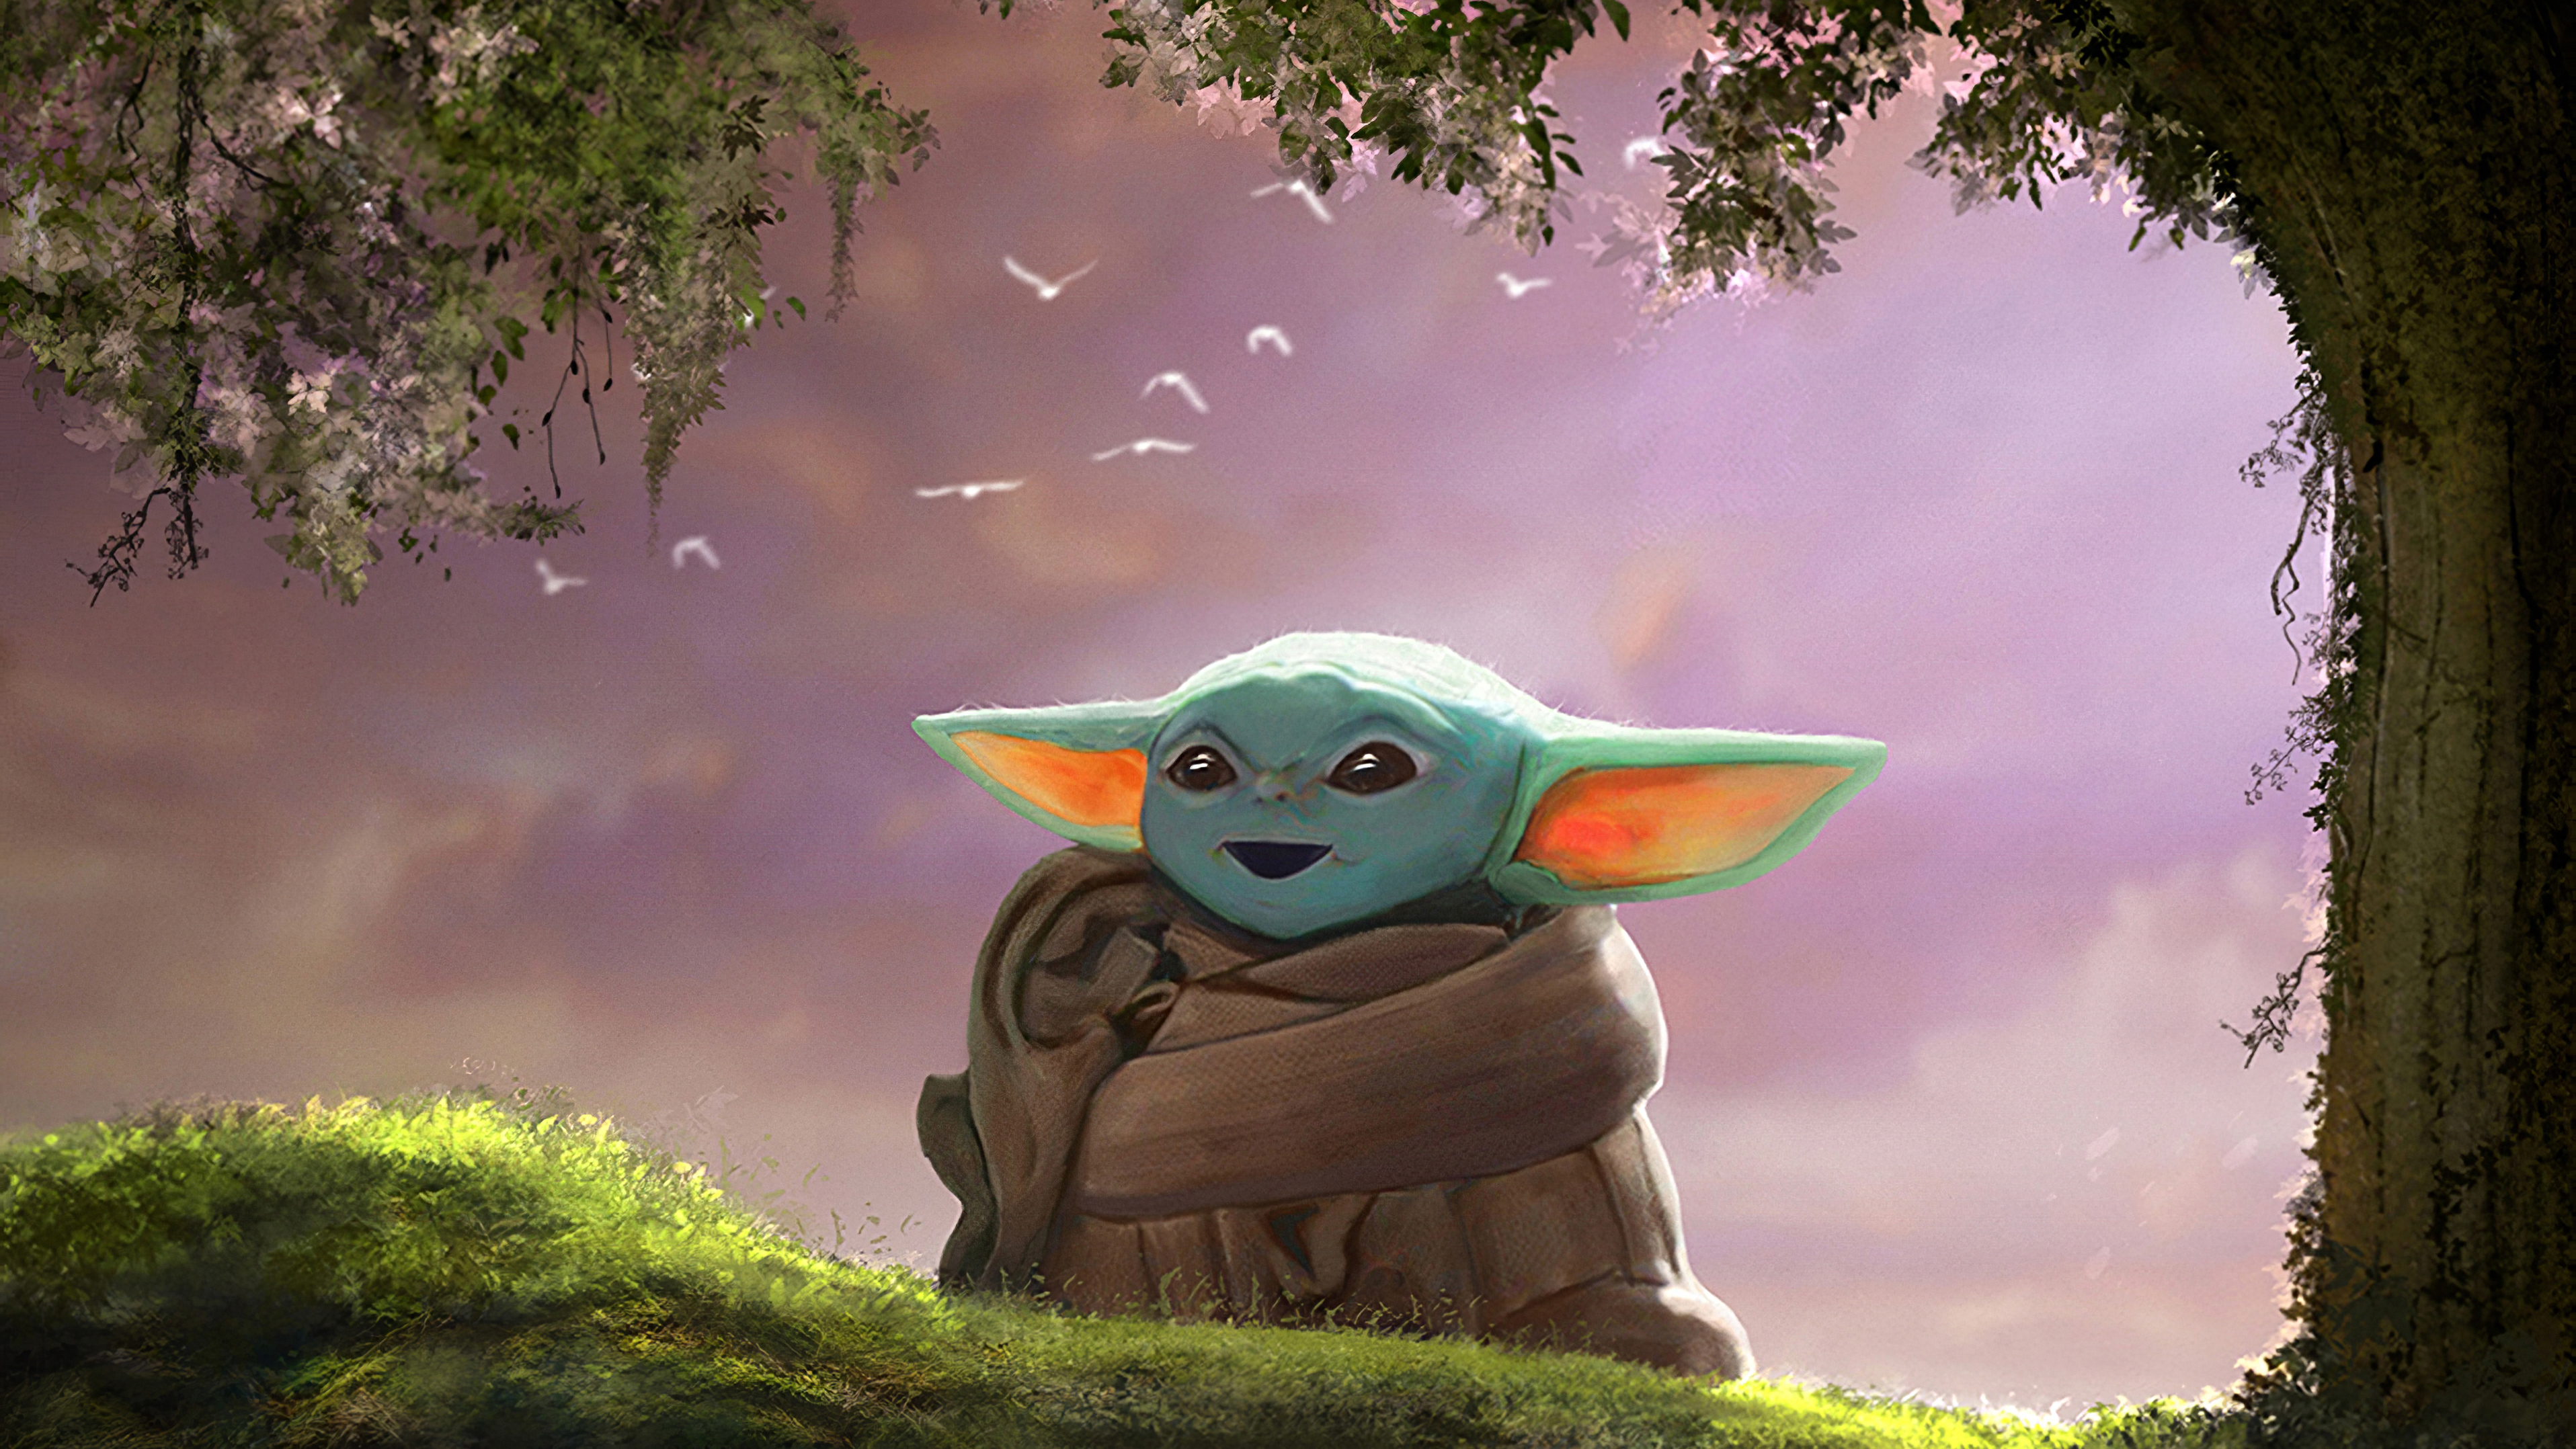 Mandalorian 4k Wallpaper Baby Yoda Hd Images